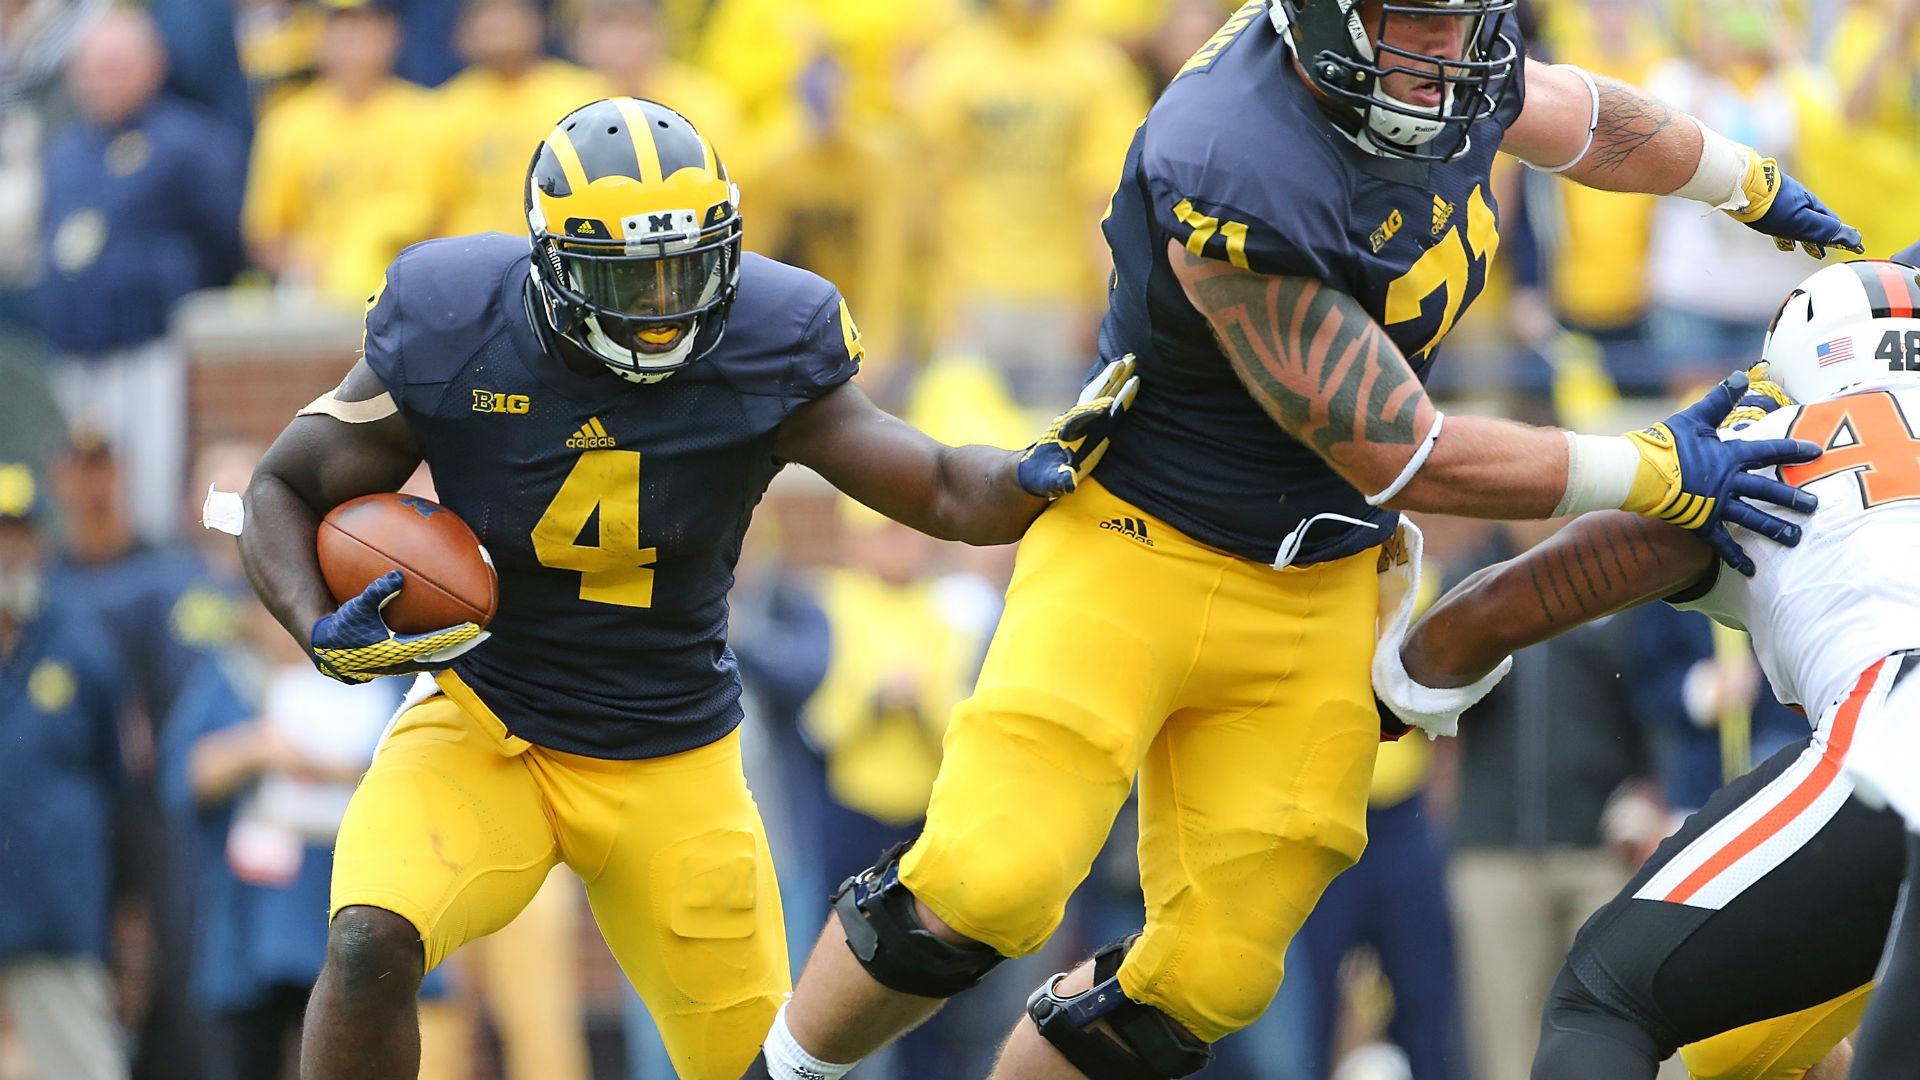 The Michigan way: Punish with power run game | NCAA Football | Sporting News